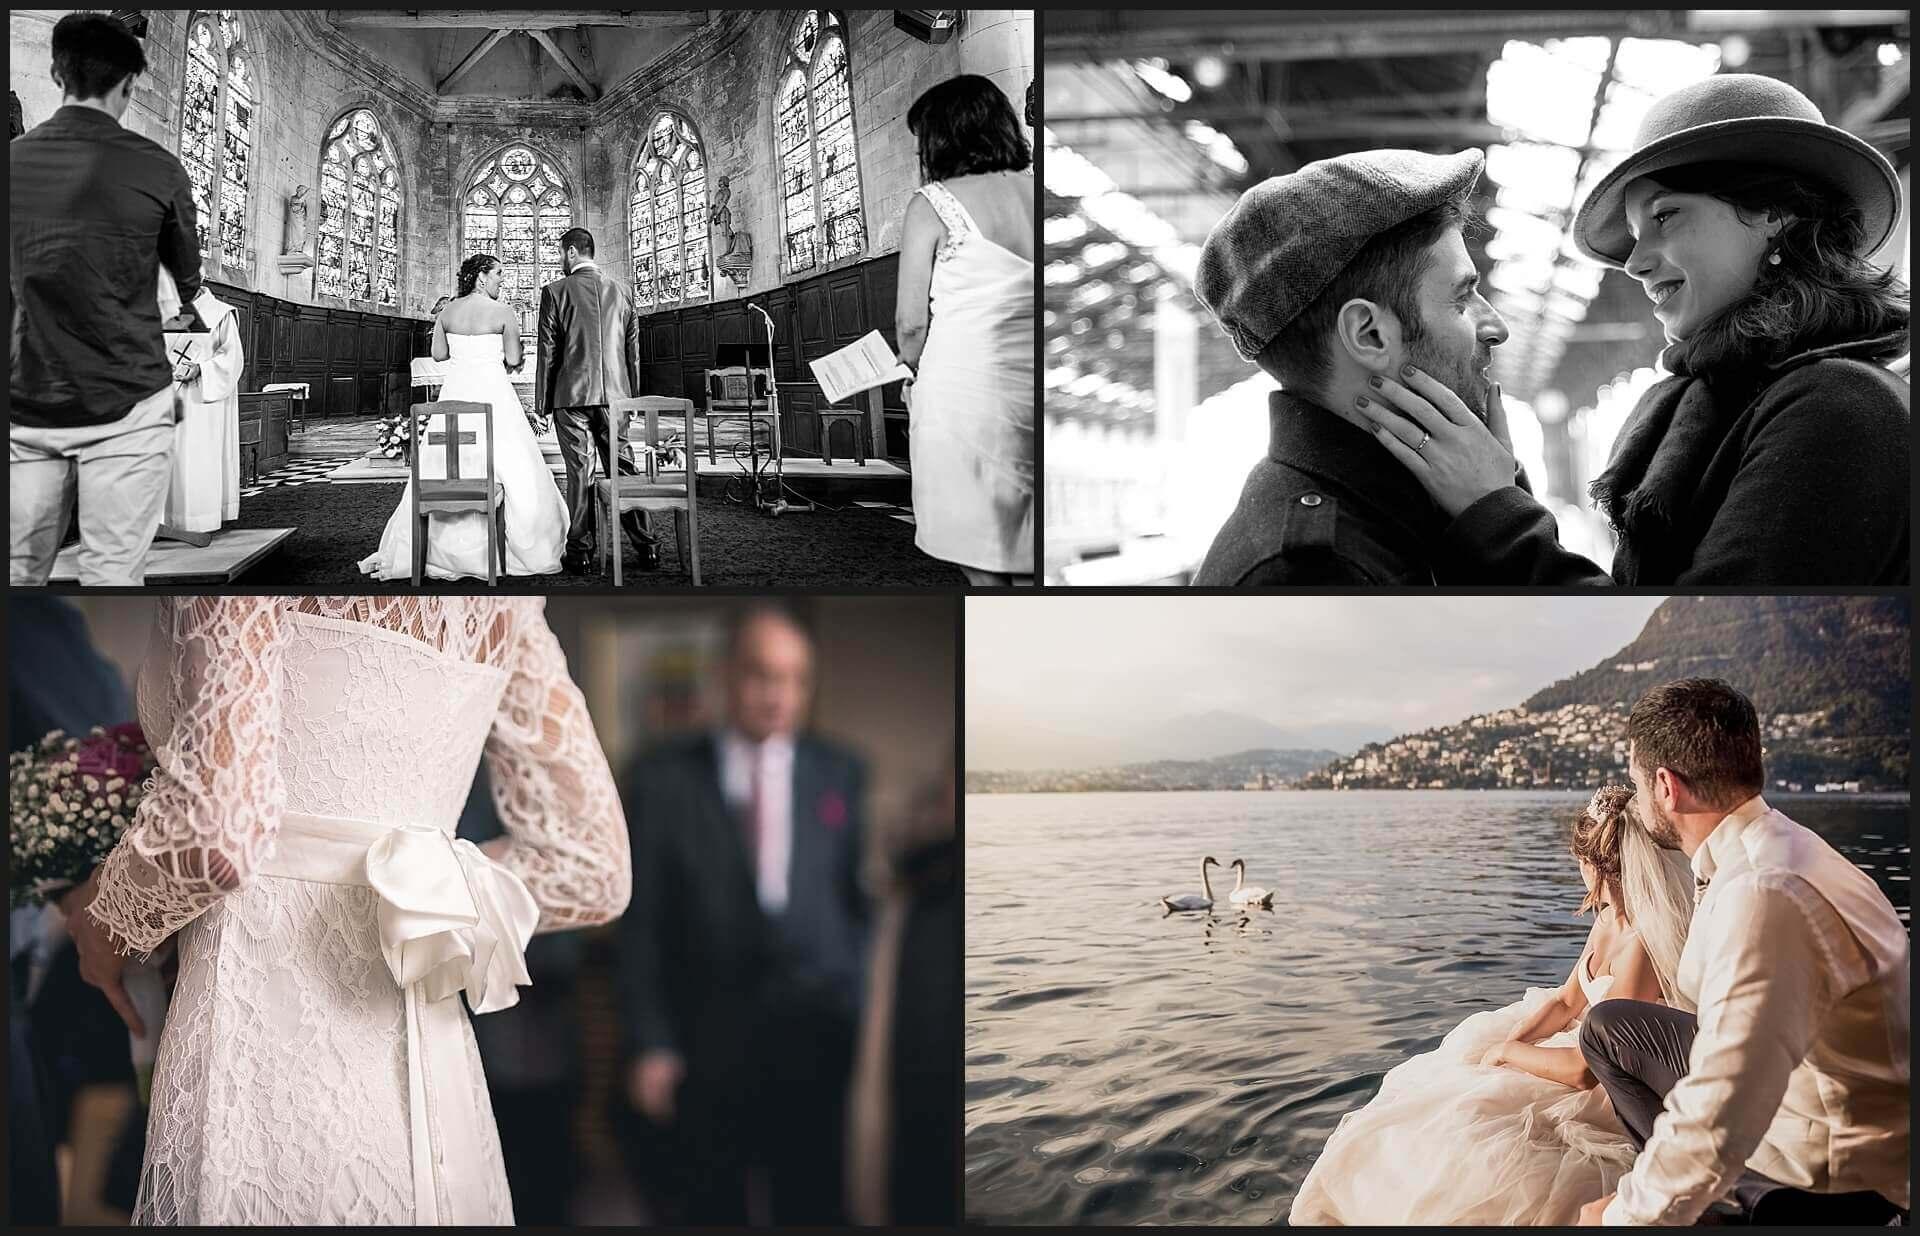 Cris Bastiane | Partenaires | Collectif | Photographe | Photos | Mariage | Paris | 2017